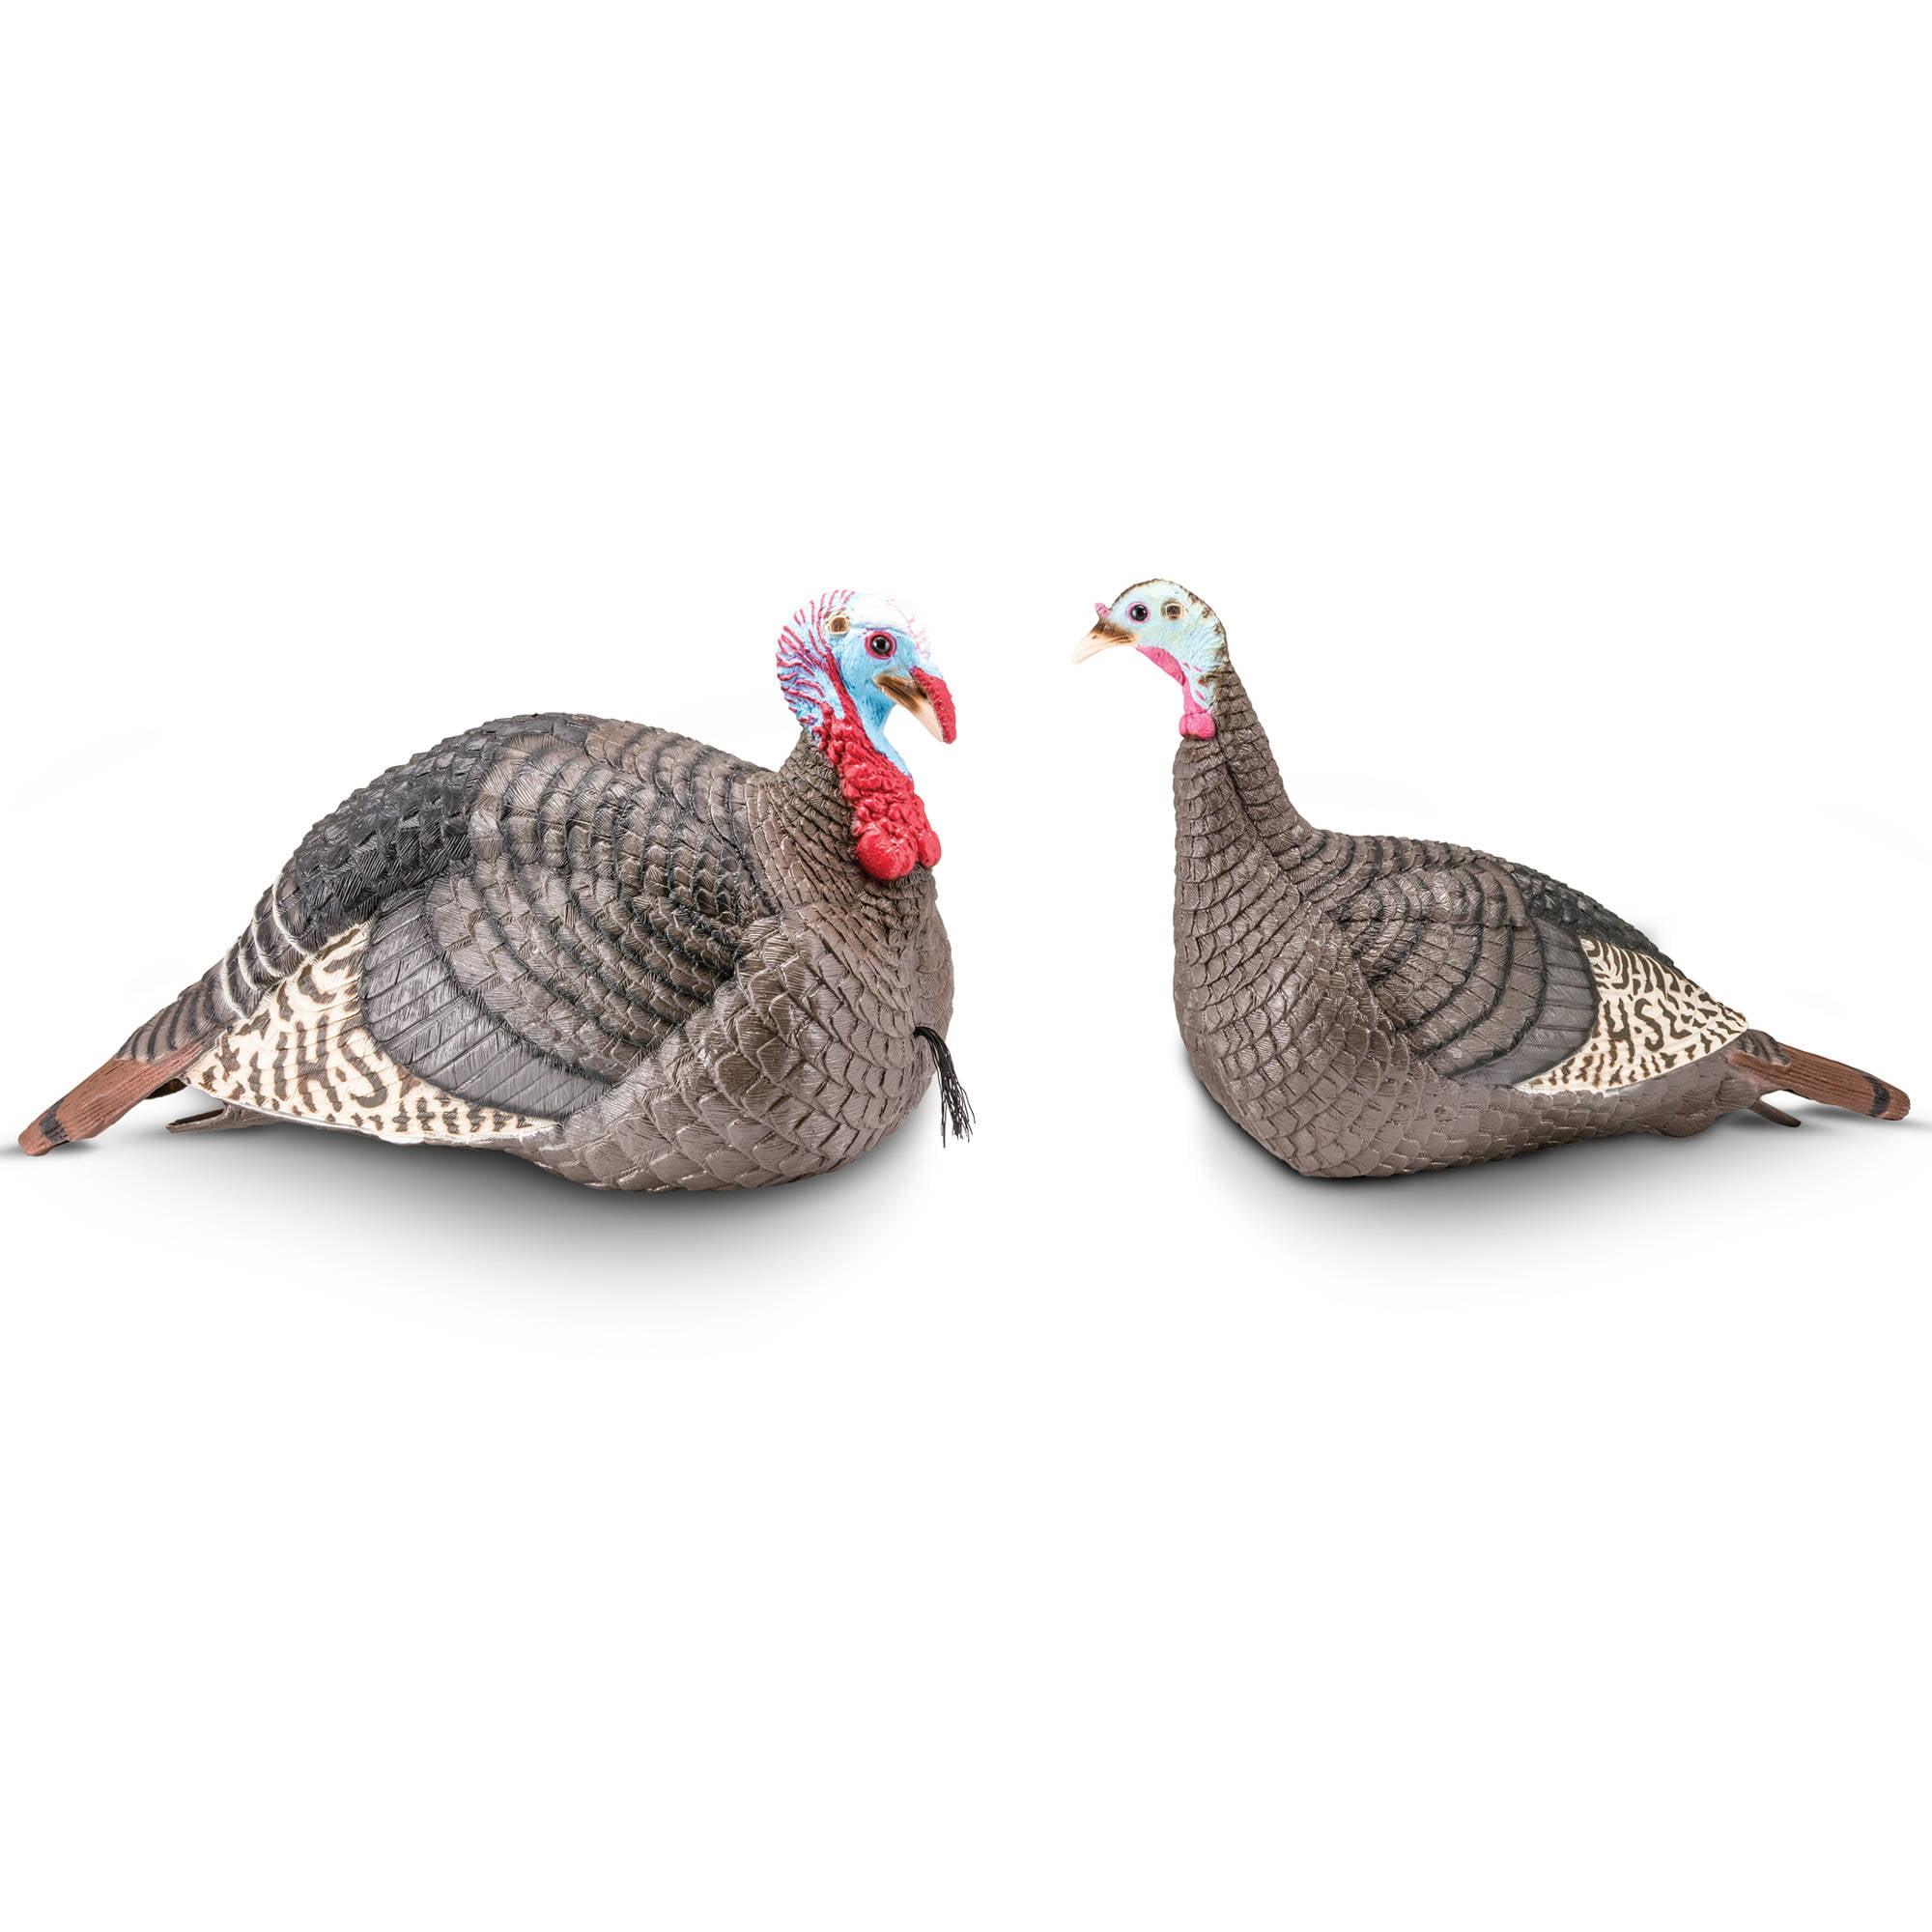 Hunters Specialties 100006 Strut-Lite Flock Decoy 3-Pack